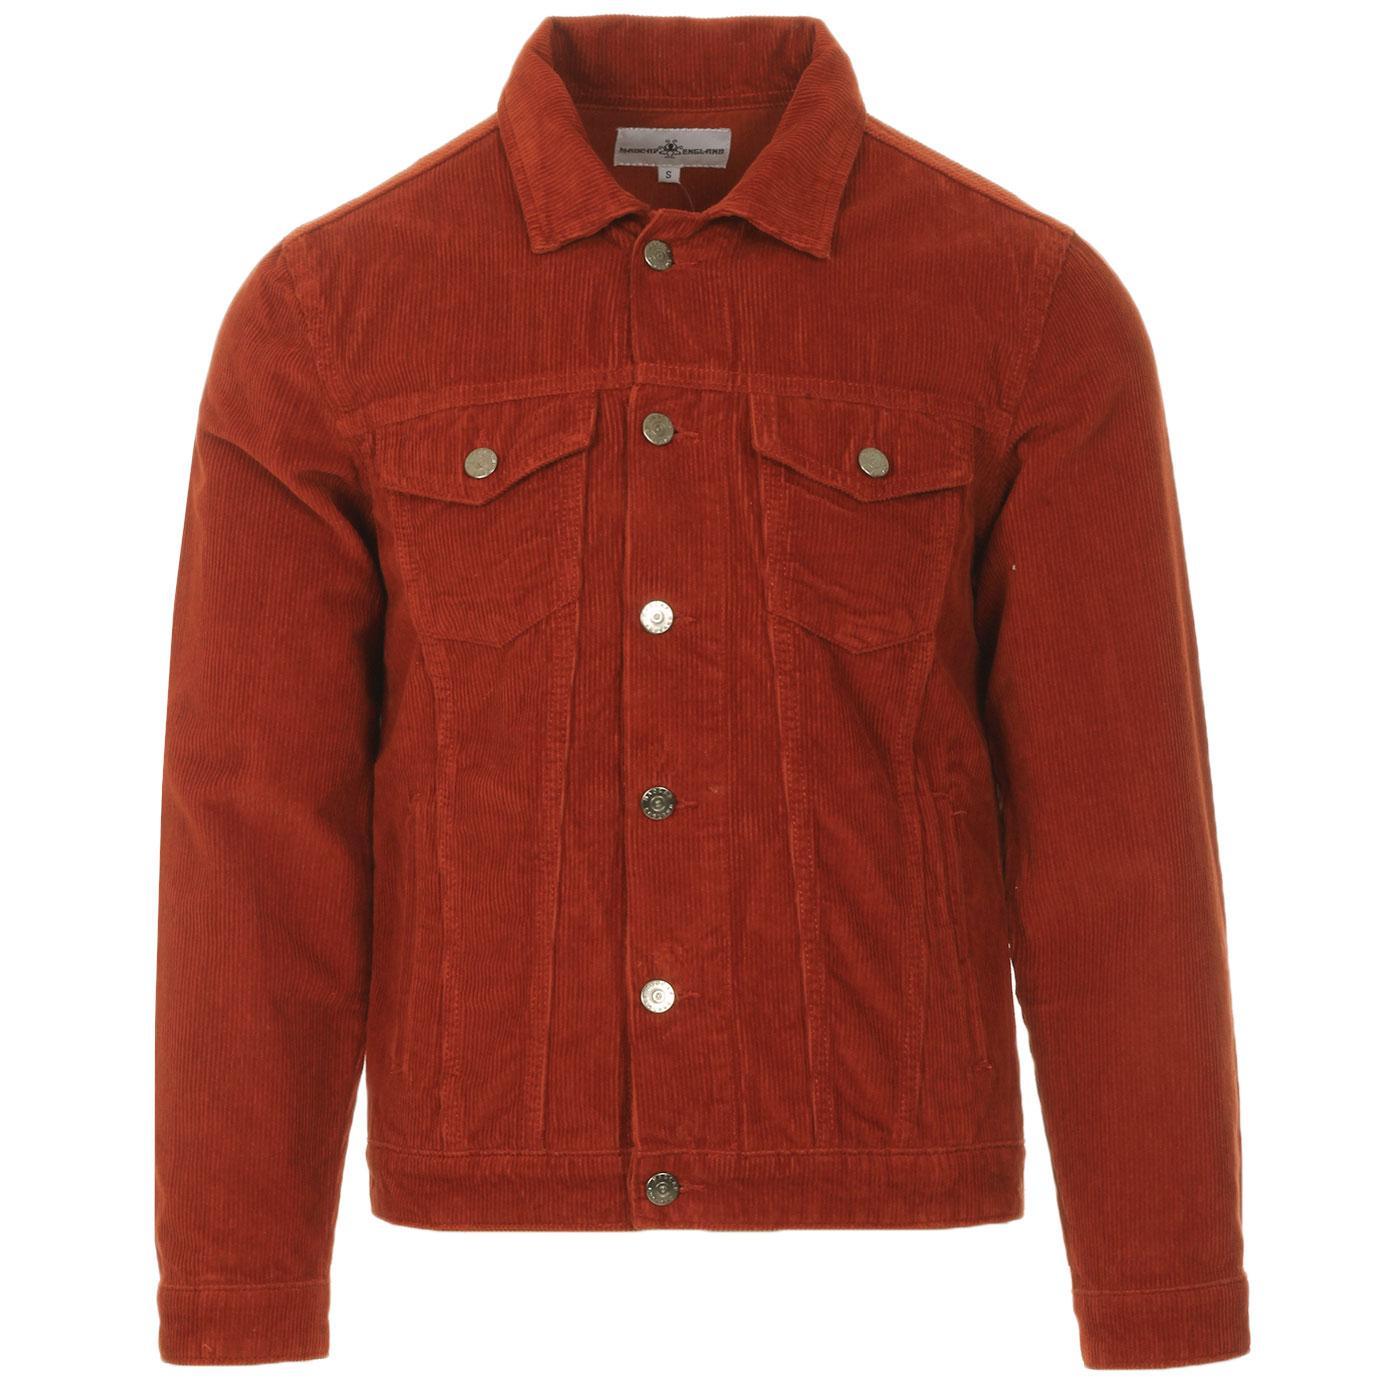 Madcap England Woburn Retro Mod Cord Western Trucker jacket in Rust